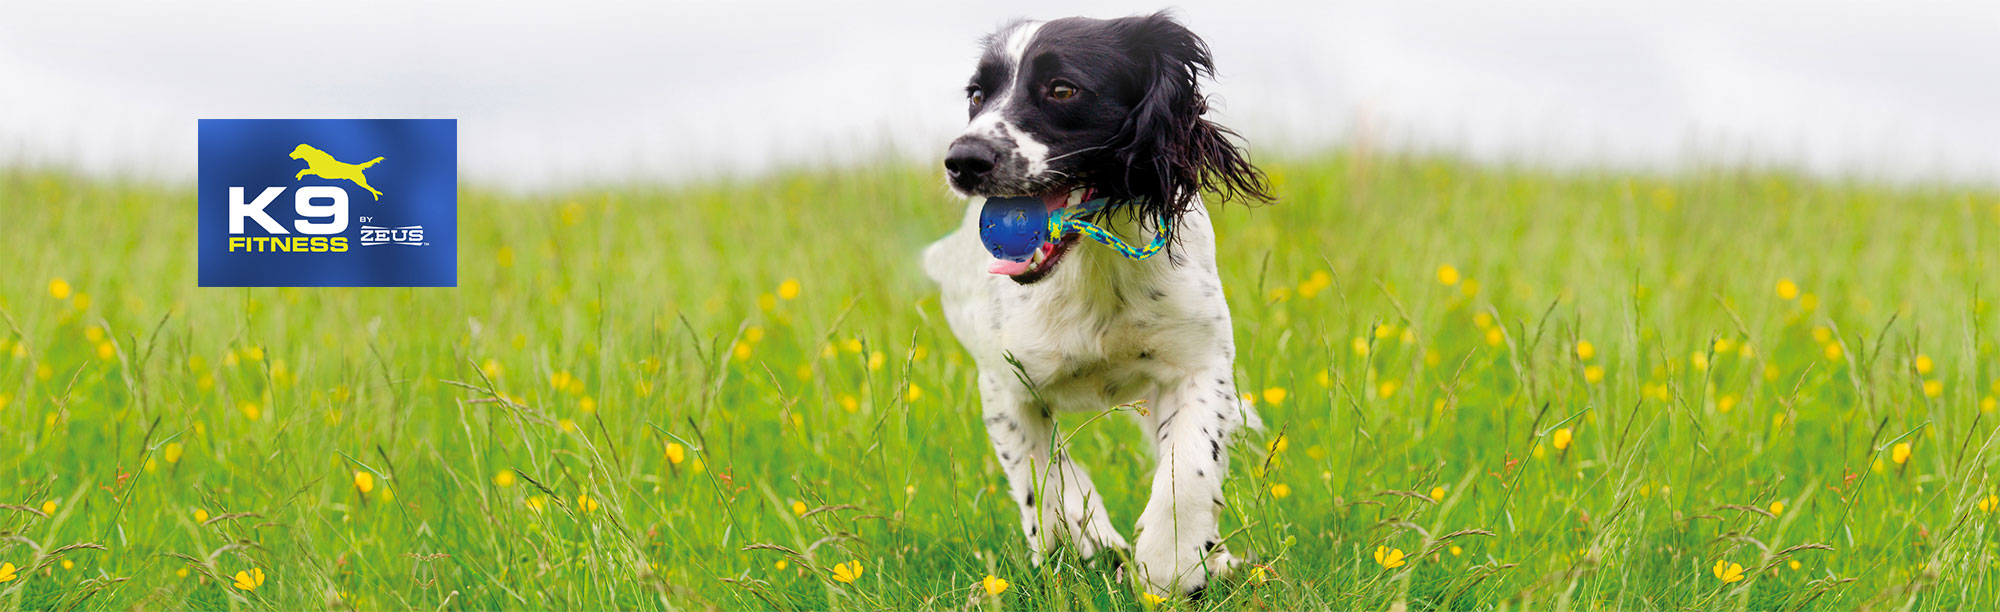 Zeus K9 Fitness Hundespielzeug